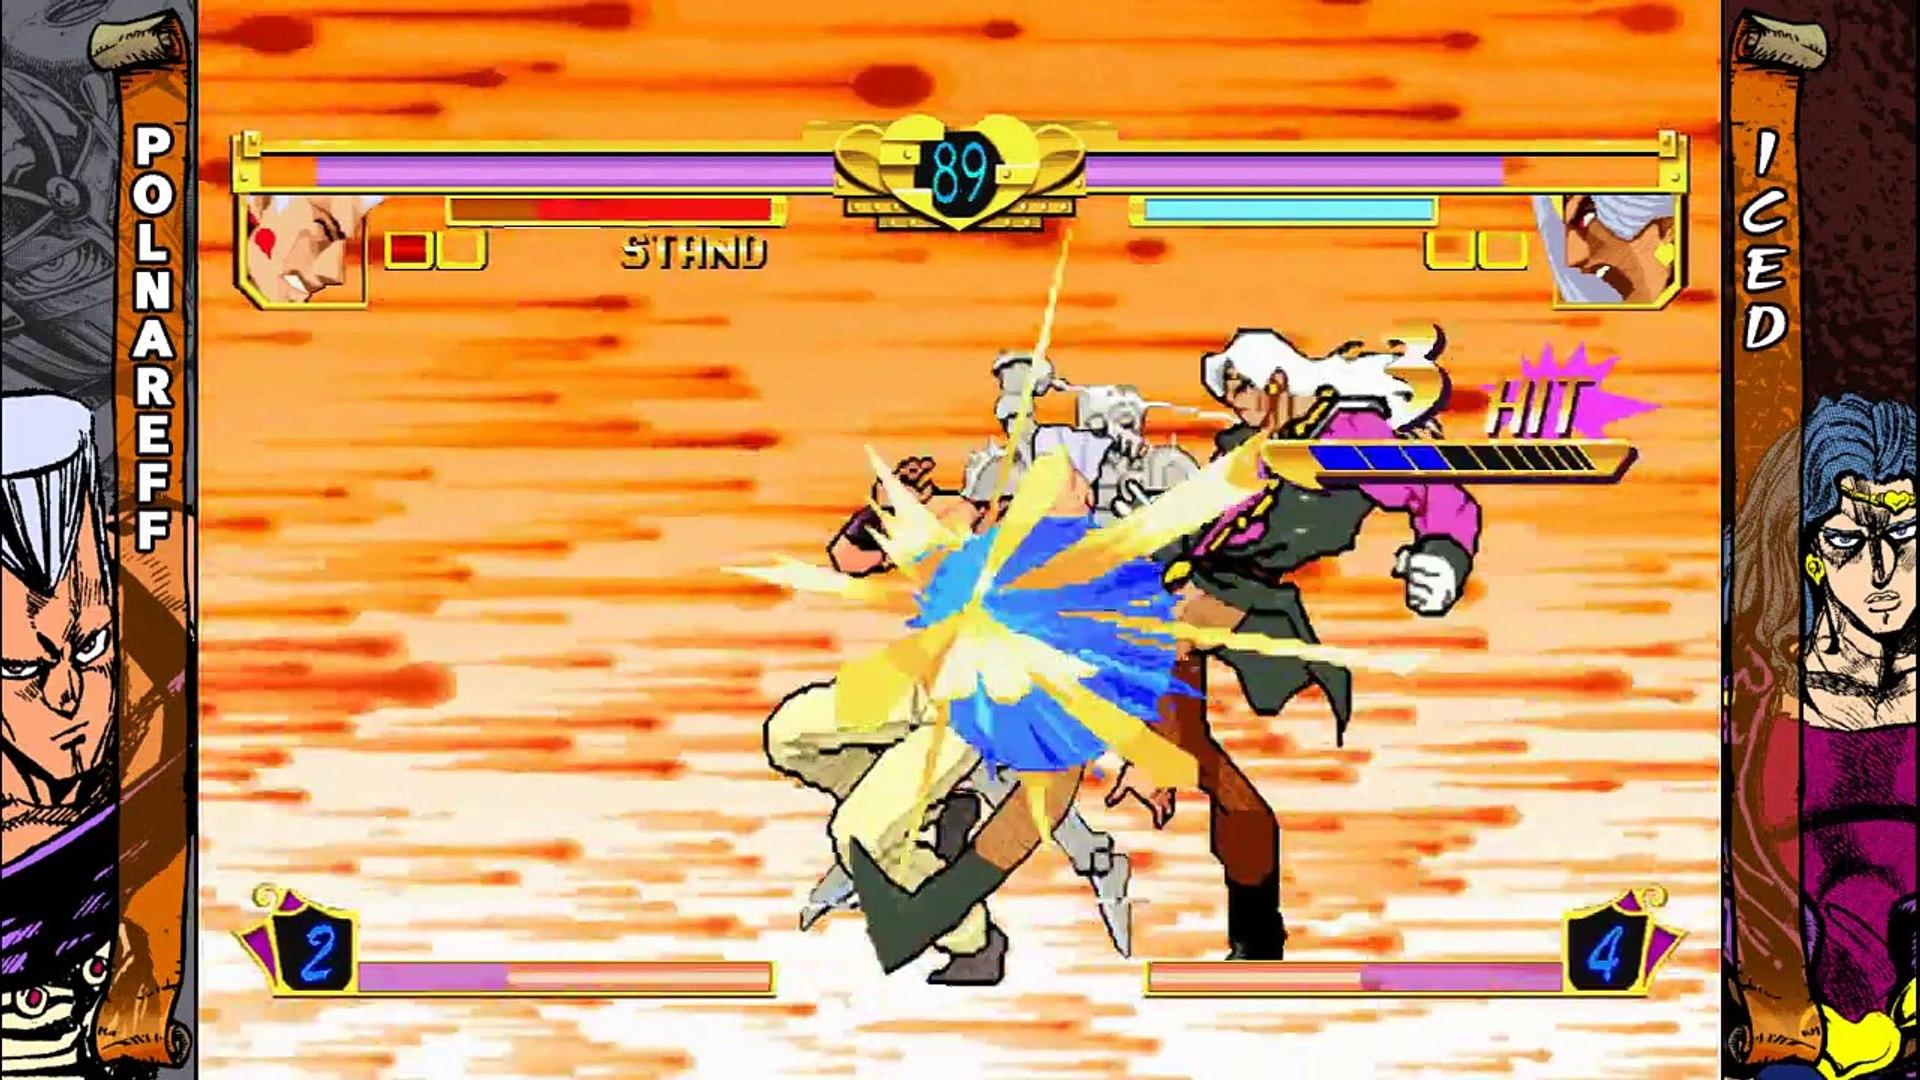 Extrait / Gameplay - Jojo's Bizarre Adventure HD (Gameplay Polnareff VS Iced - HD Fight)